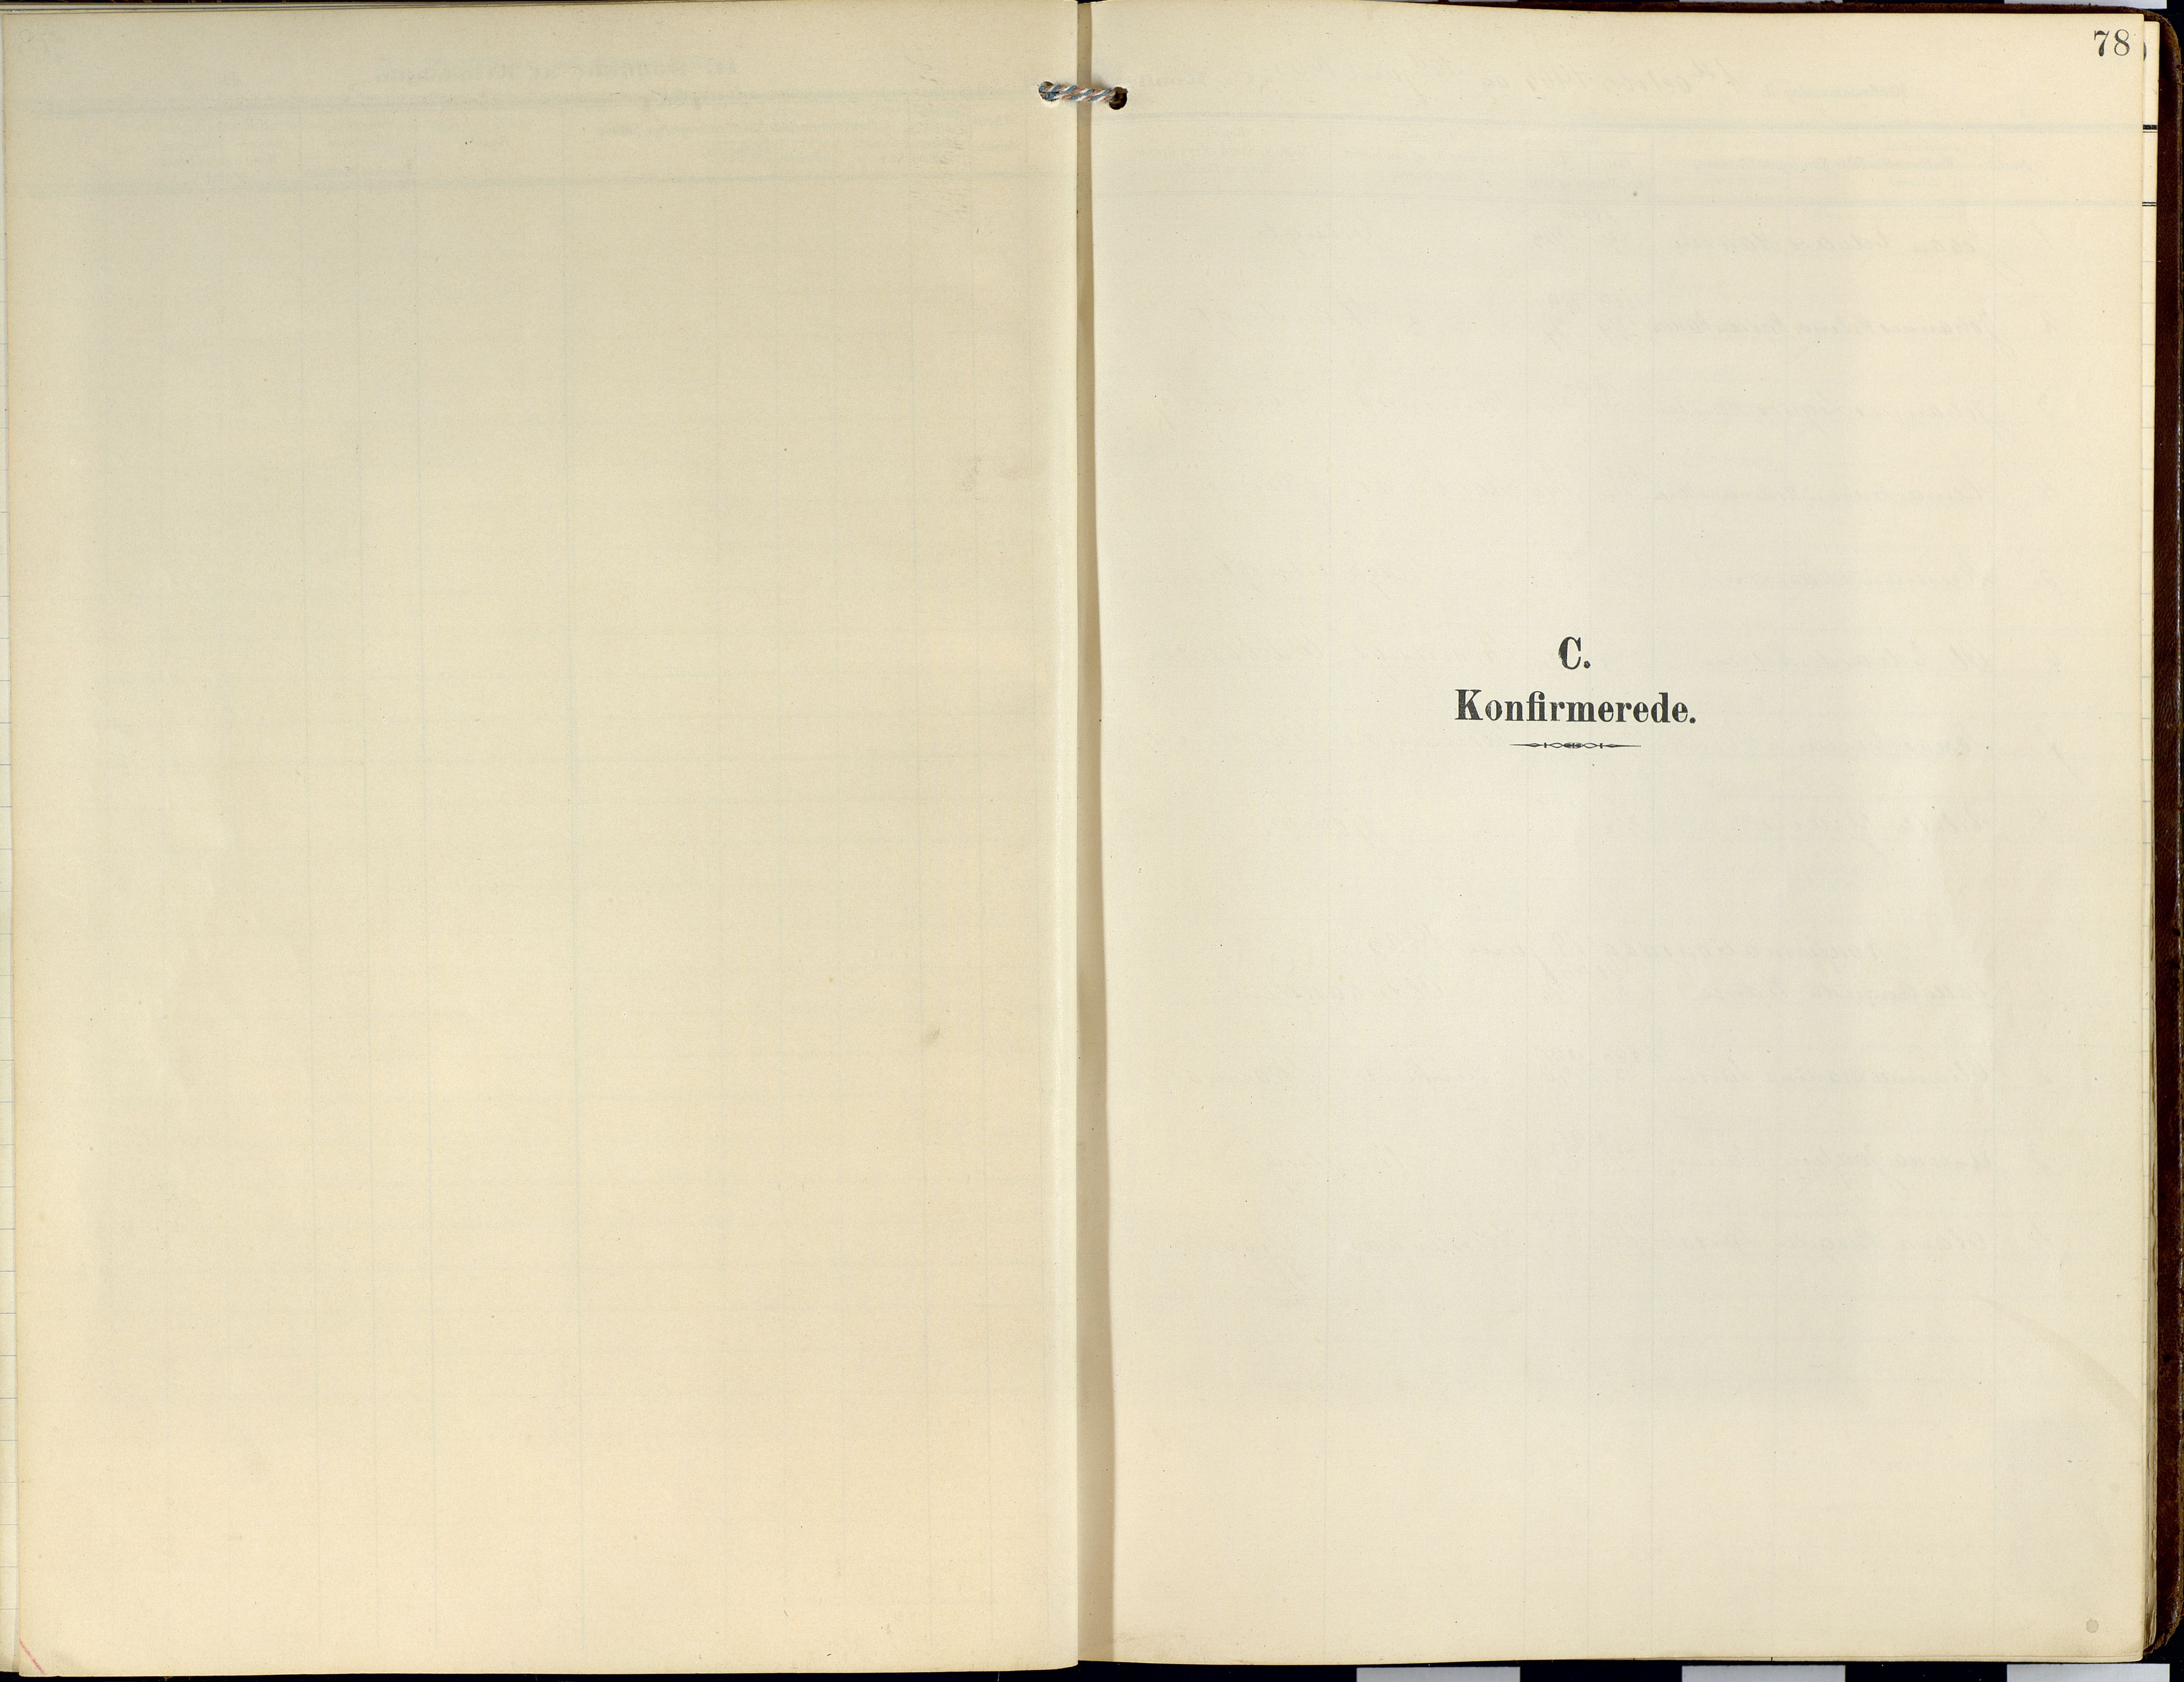 SATØ, Lyngen sokneprestembete, Ministerialbok nr. 14, 1905-1920, s. 78